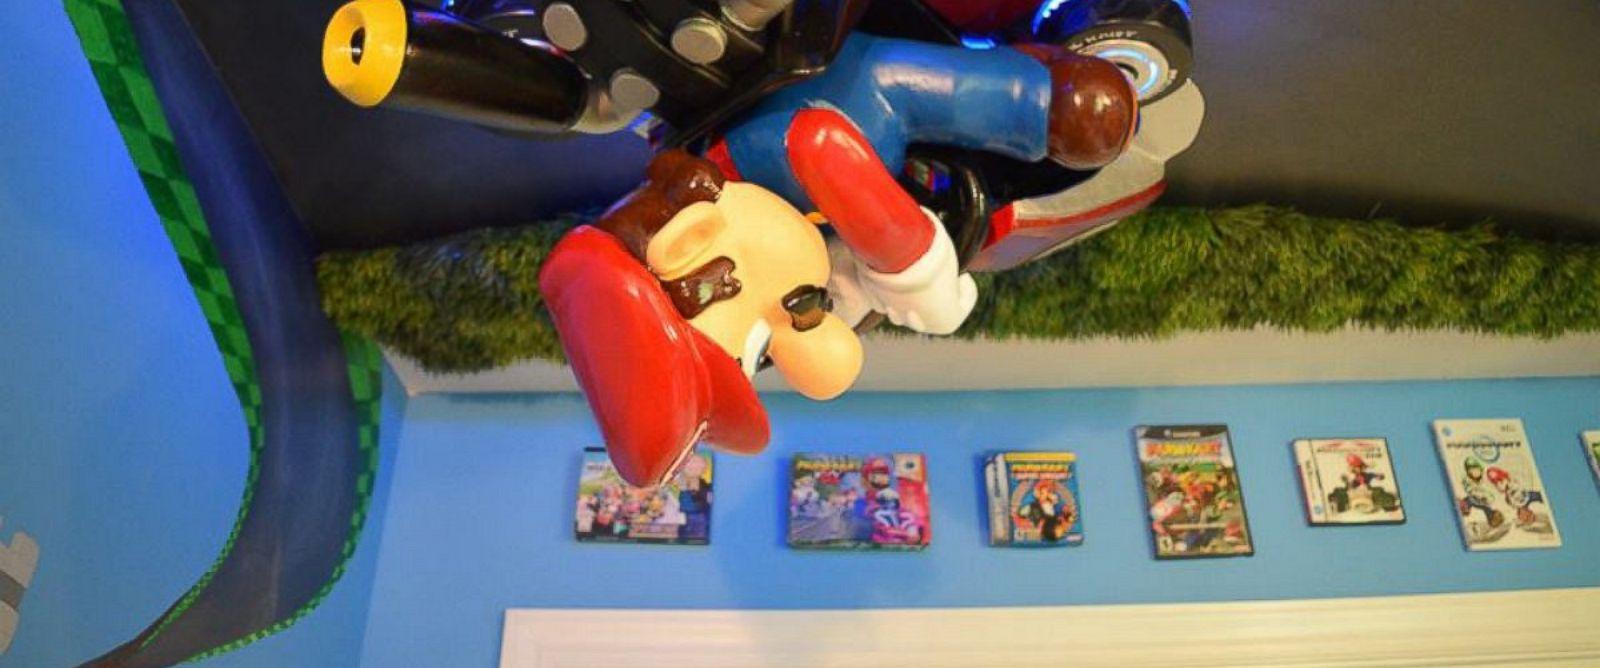 Mario Bedroom Decor North Carolina Dad Builds Amazing Mario Kart Themed Nursery For